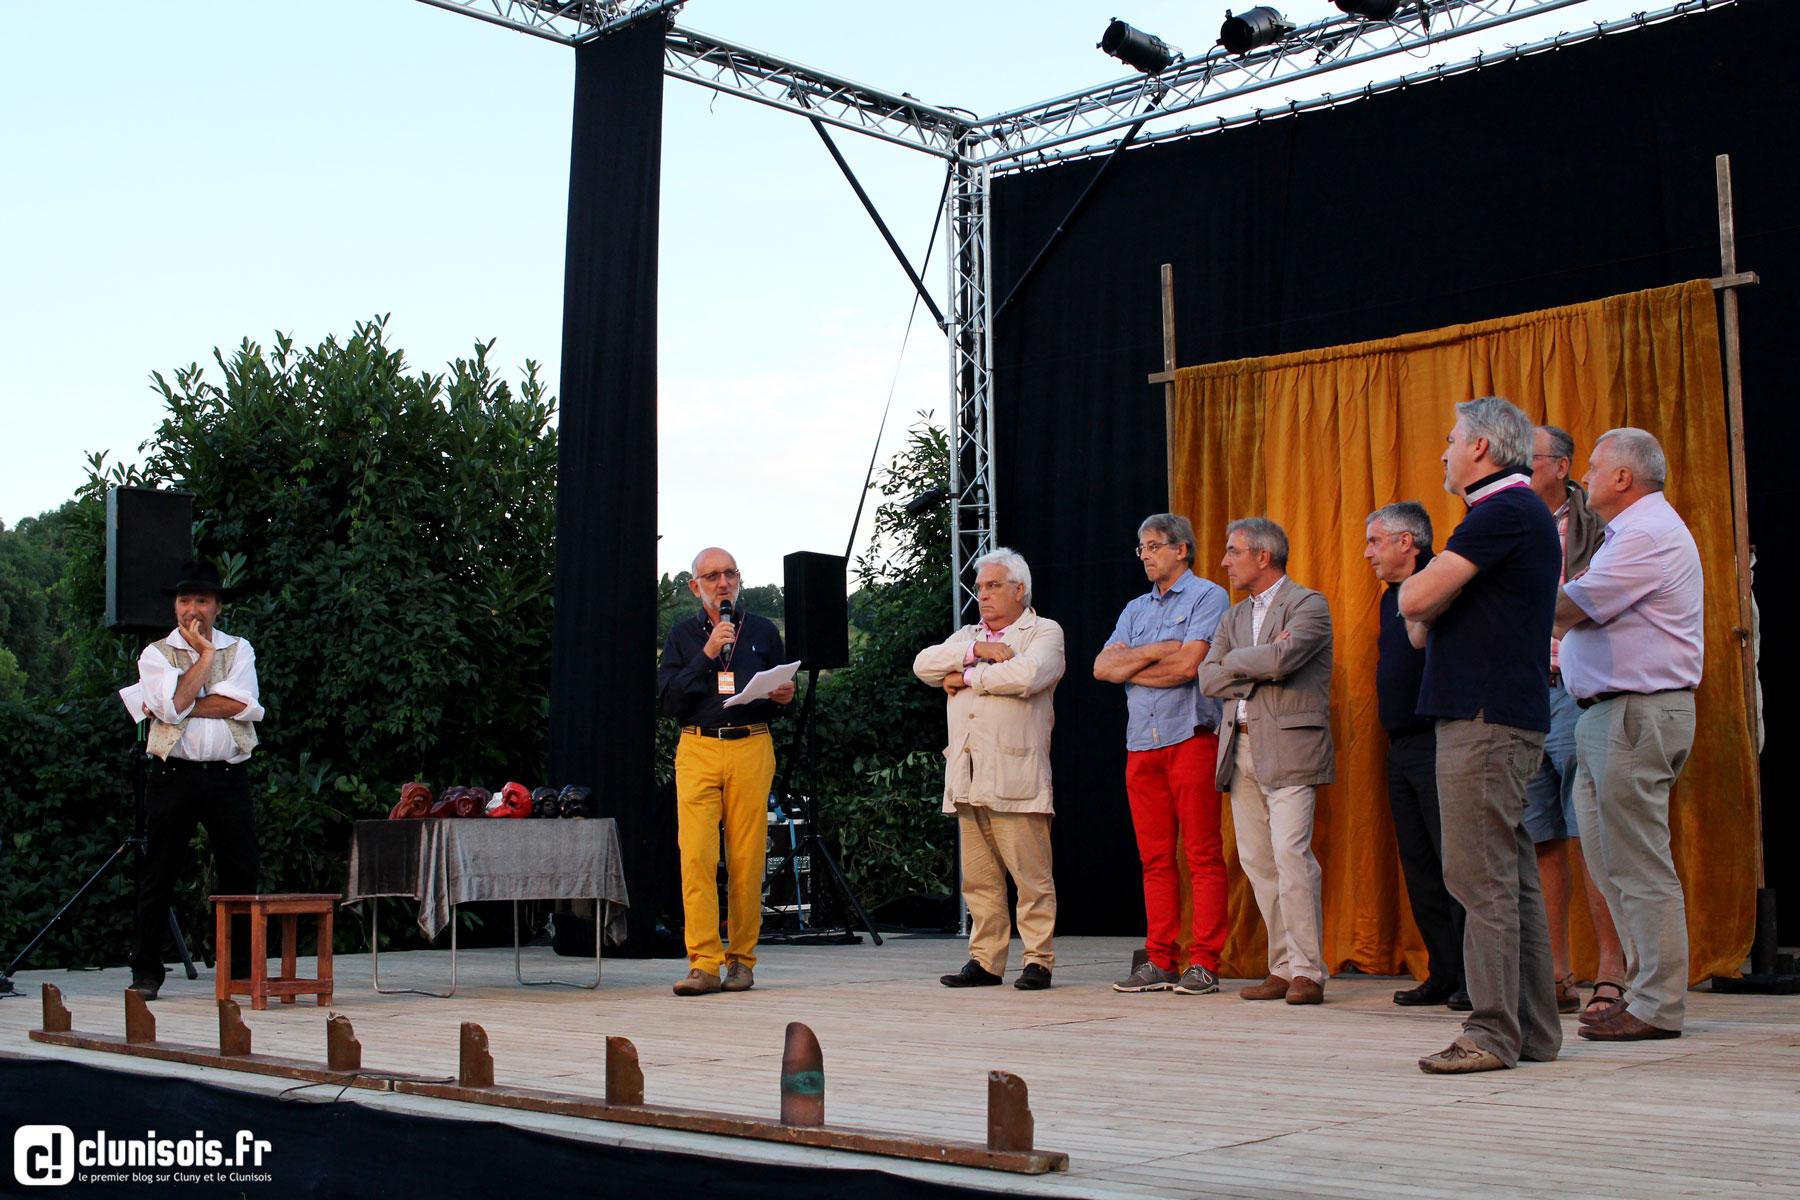 festival-lournand-2016-photo-clunisoisfr-02